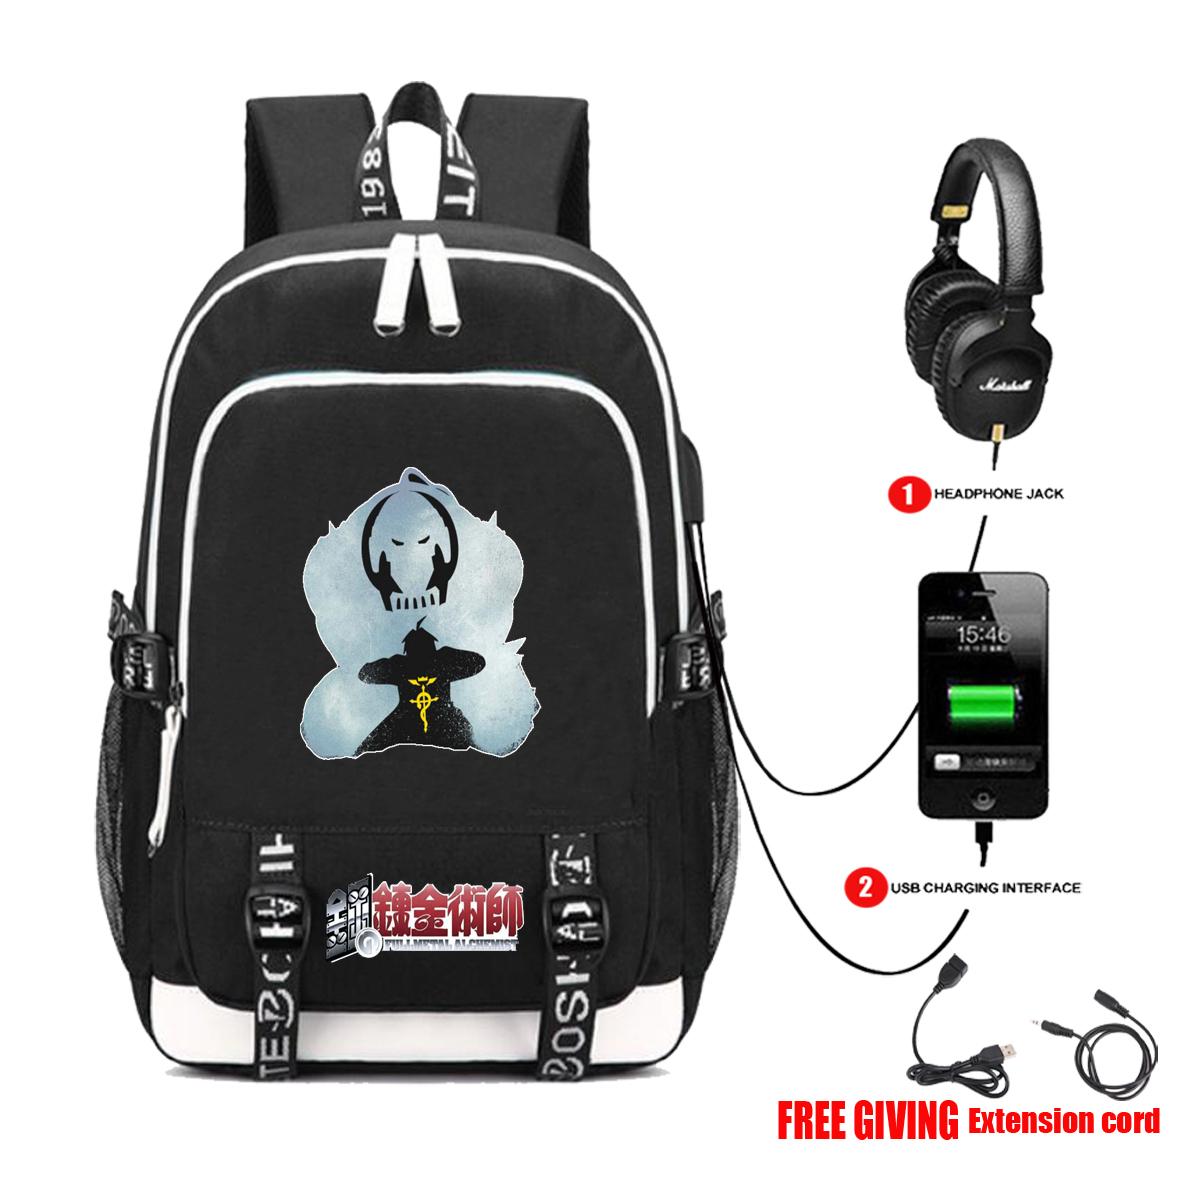 Anime steel alchemist backpack student schoolbag USB headset interface multifunctional computer bag